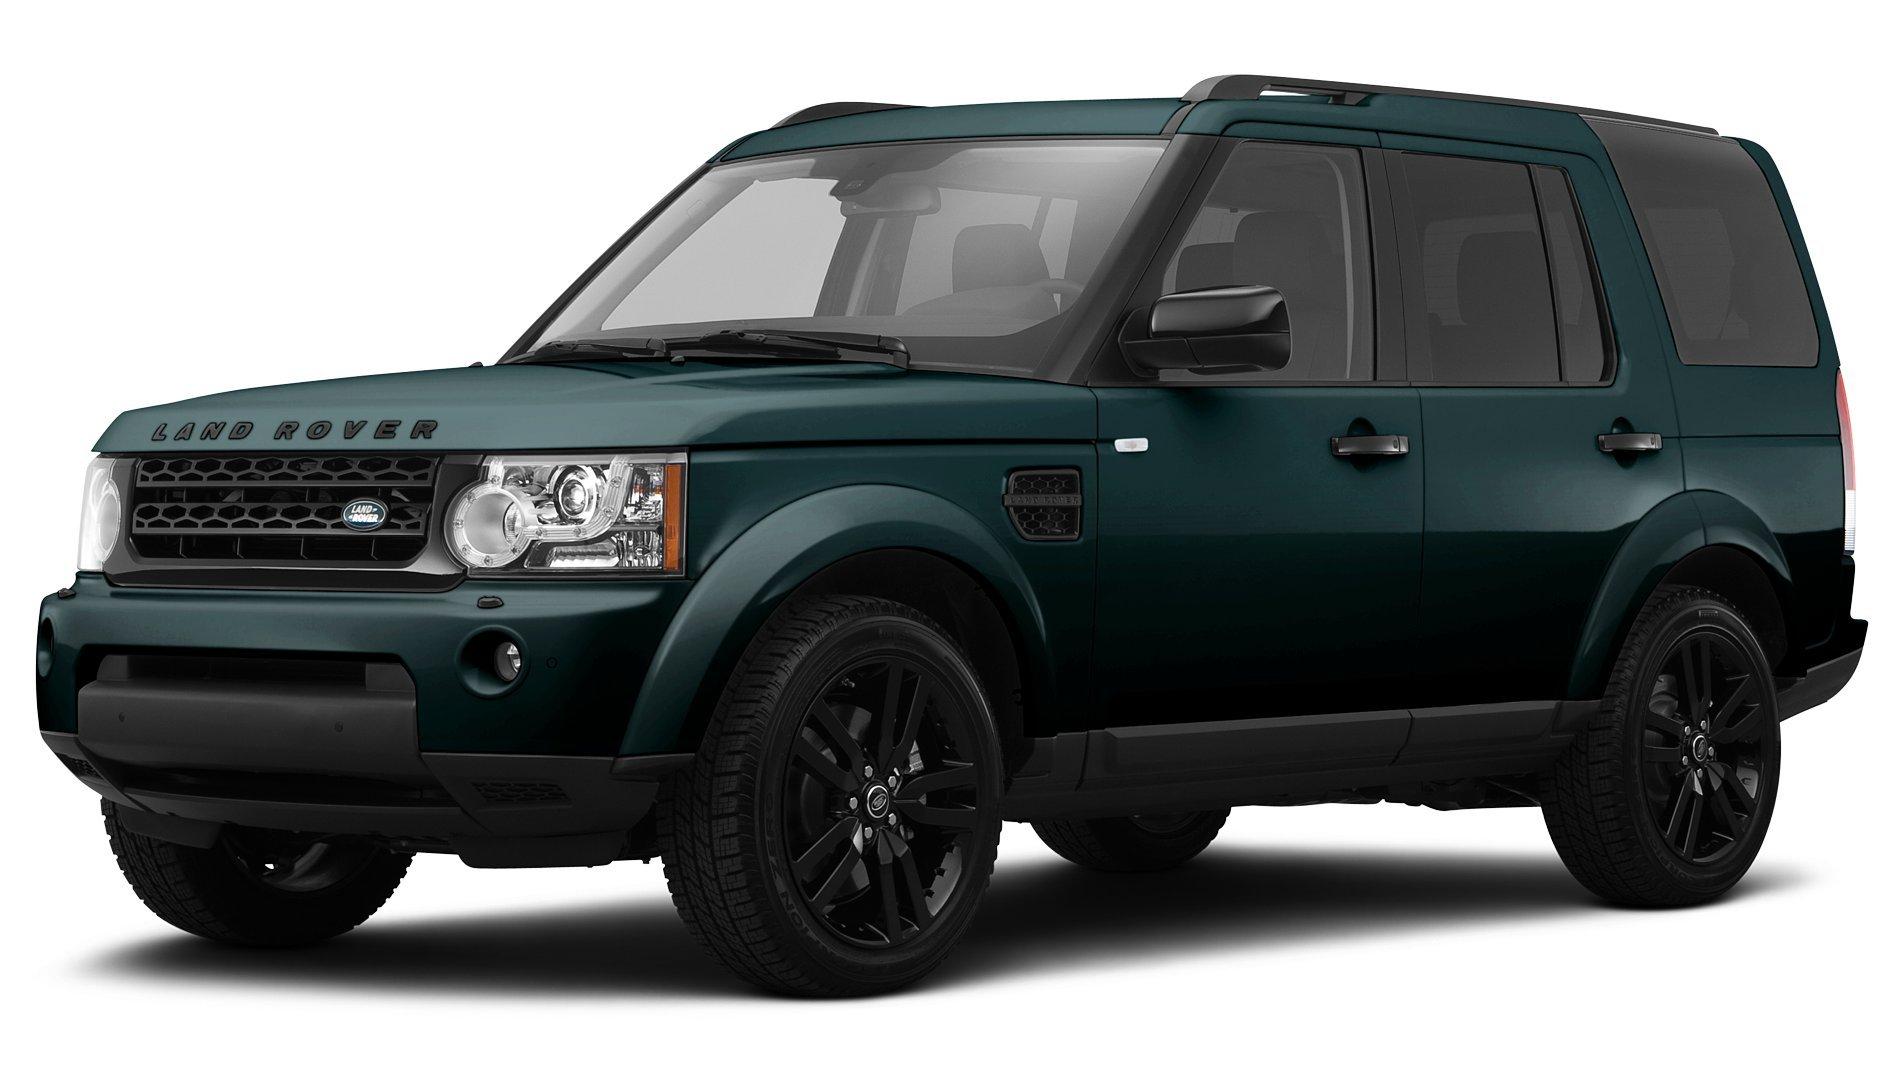 2013 land rover lr4 reviews images and specs vehicles. Black Bedroom Furniture Sets. Home Design Ideas